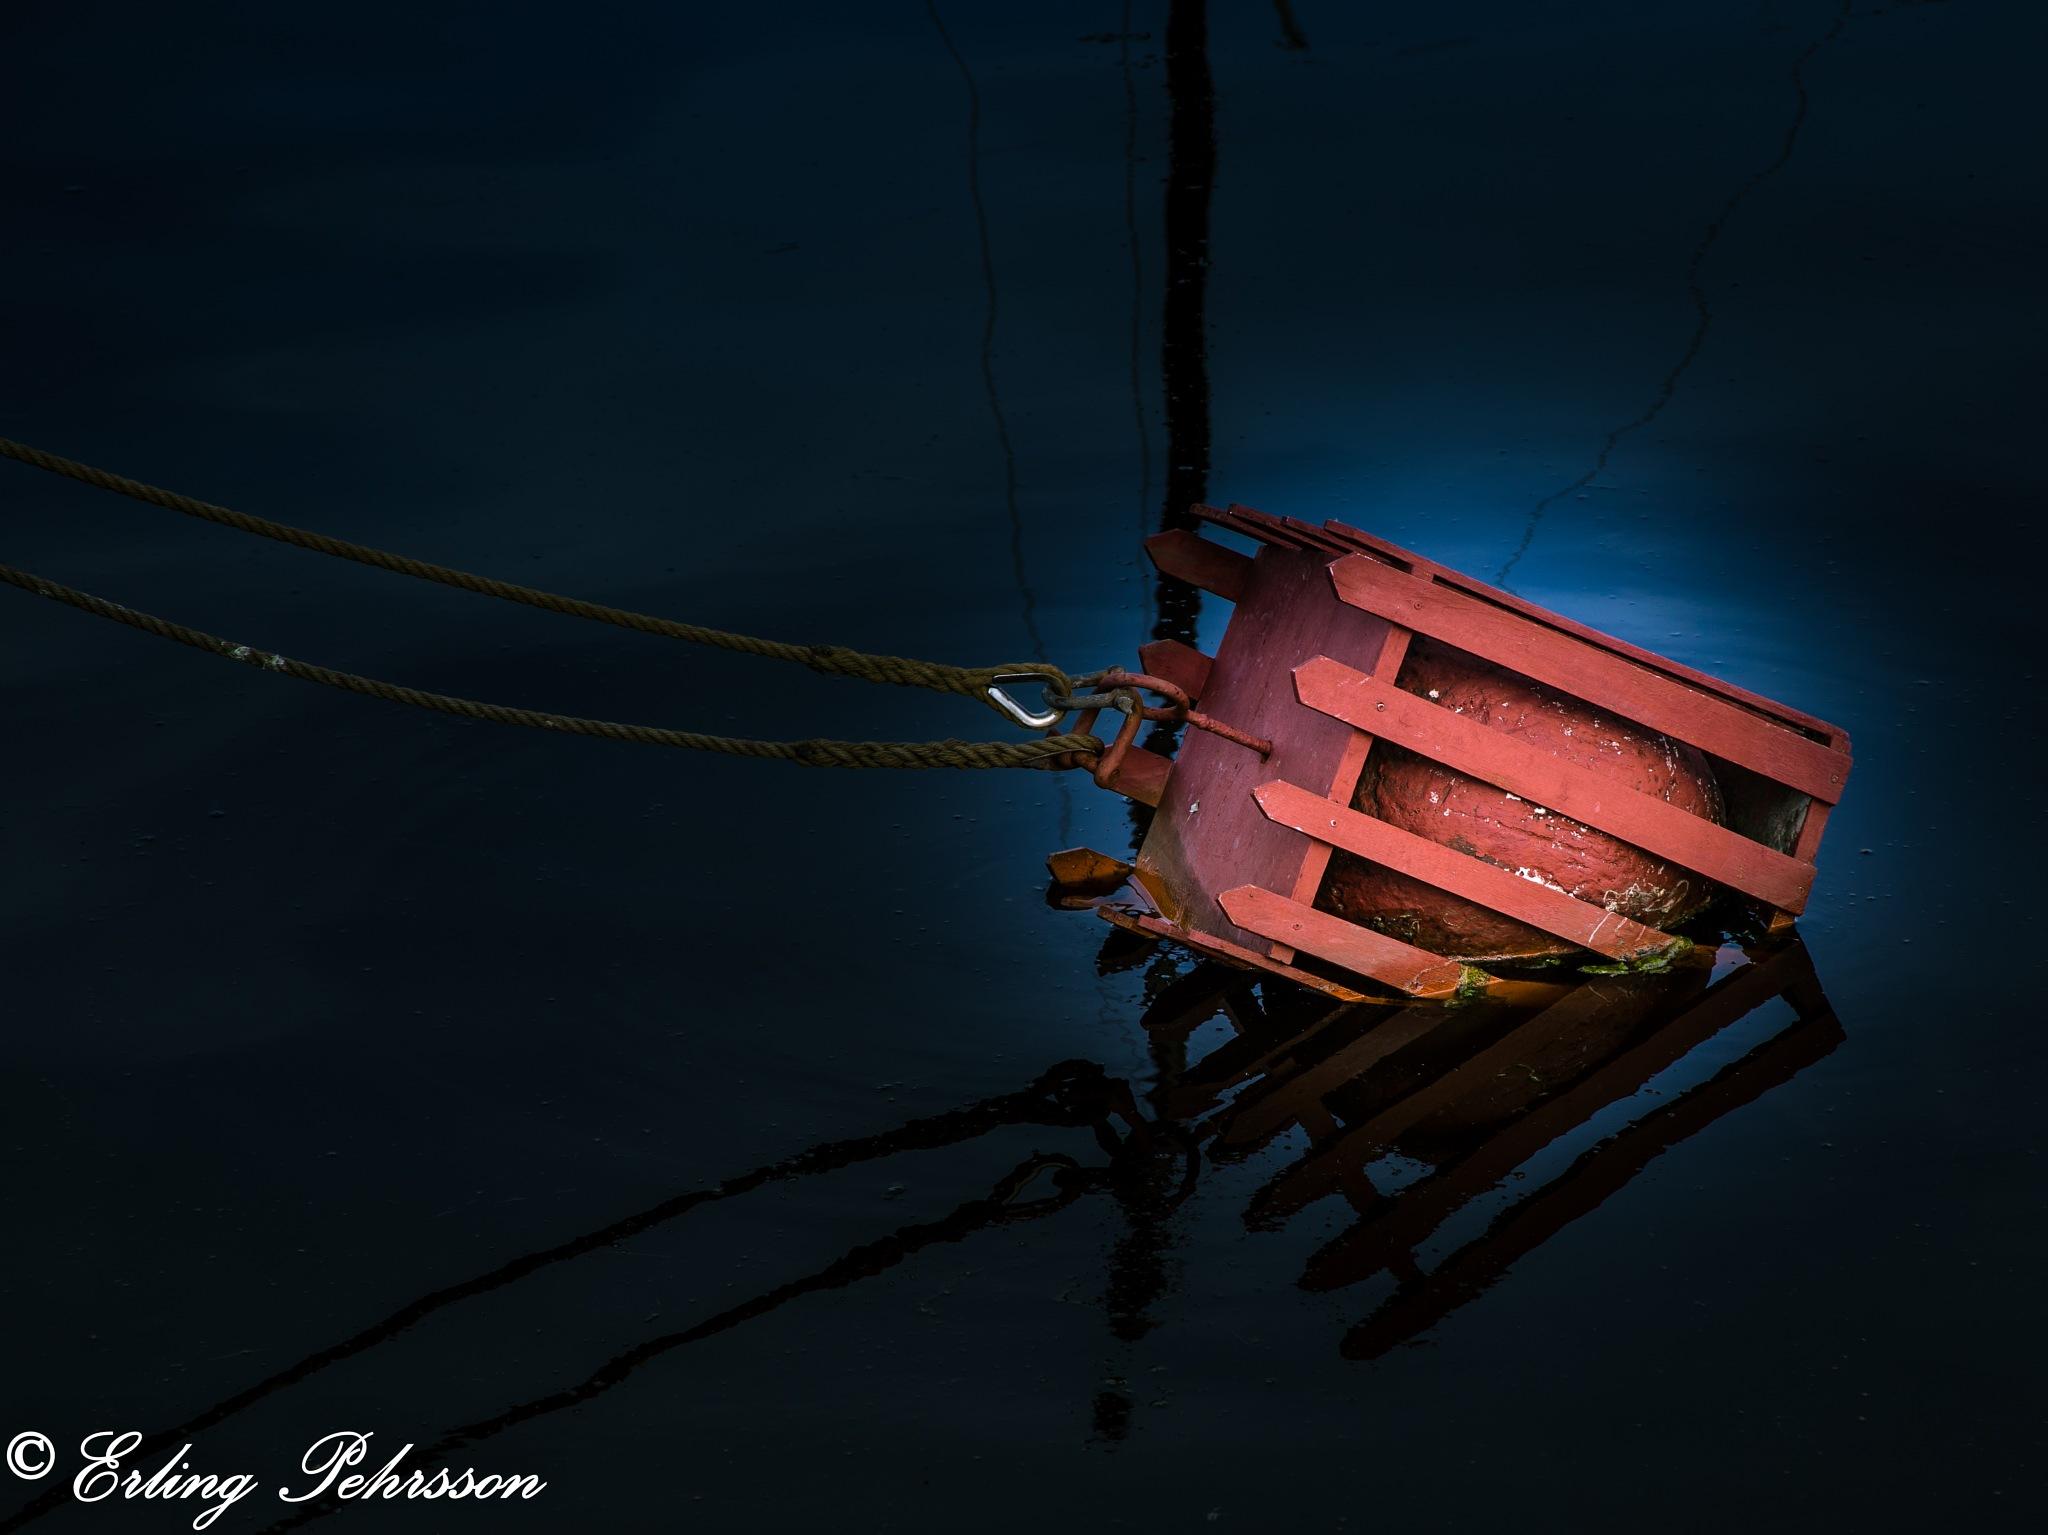 Reflection in Gislöv harbor by erling.pehrsson